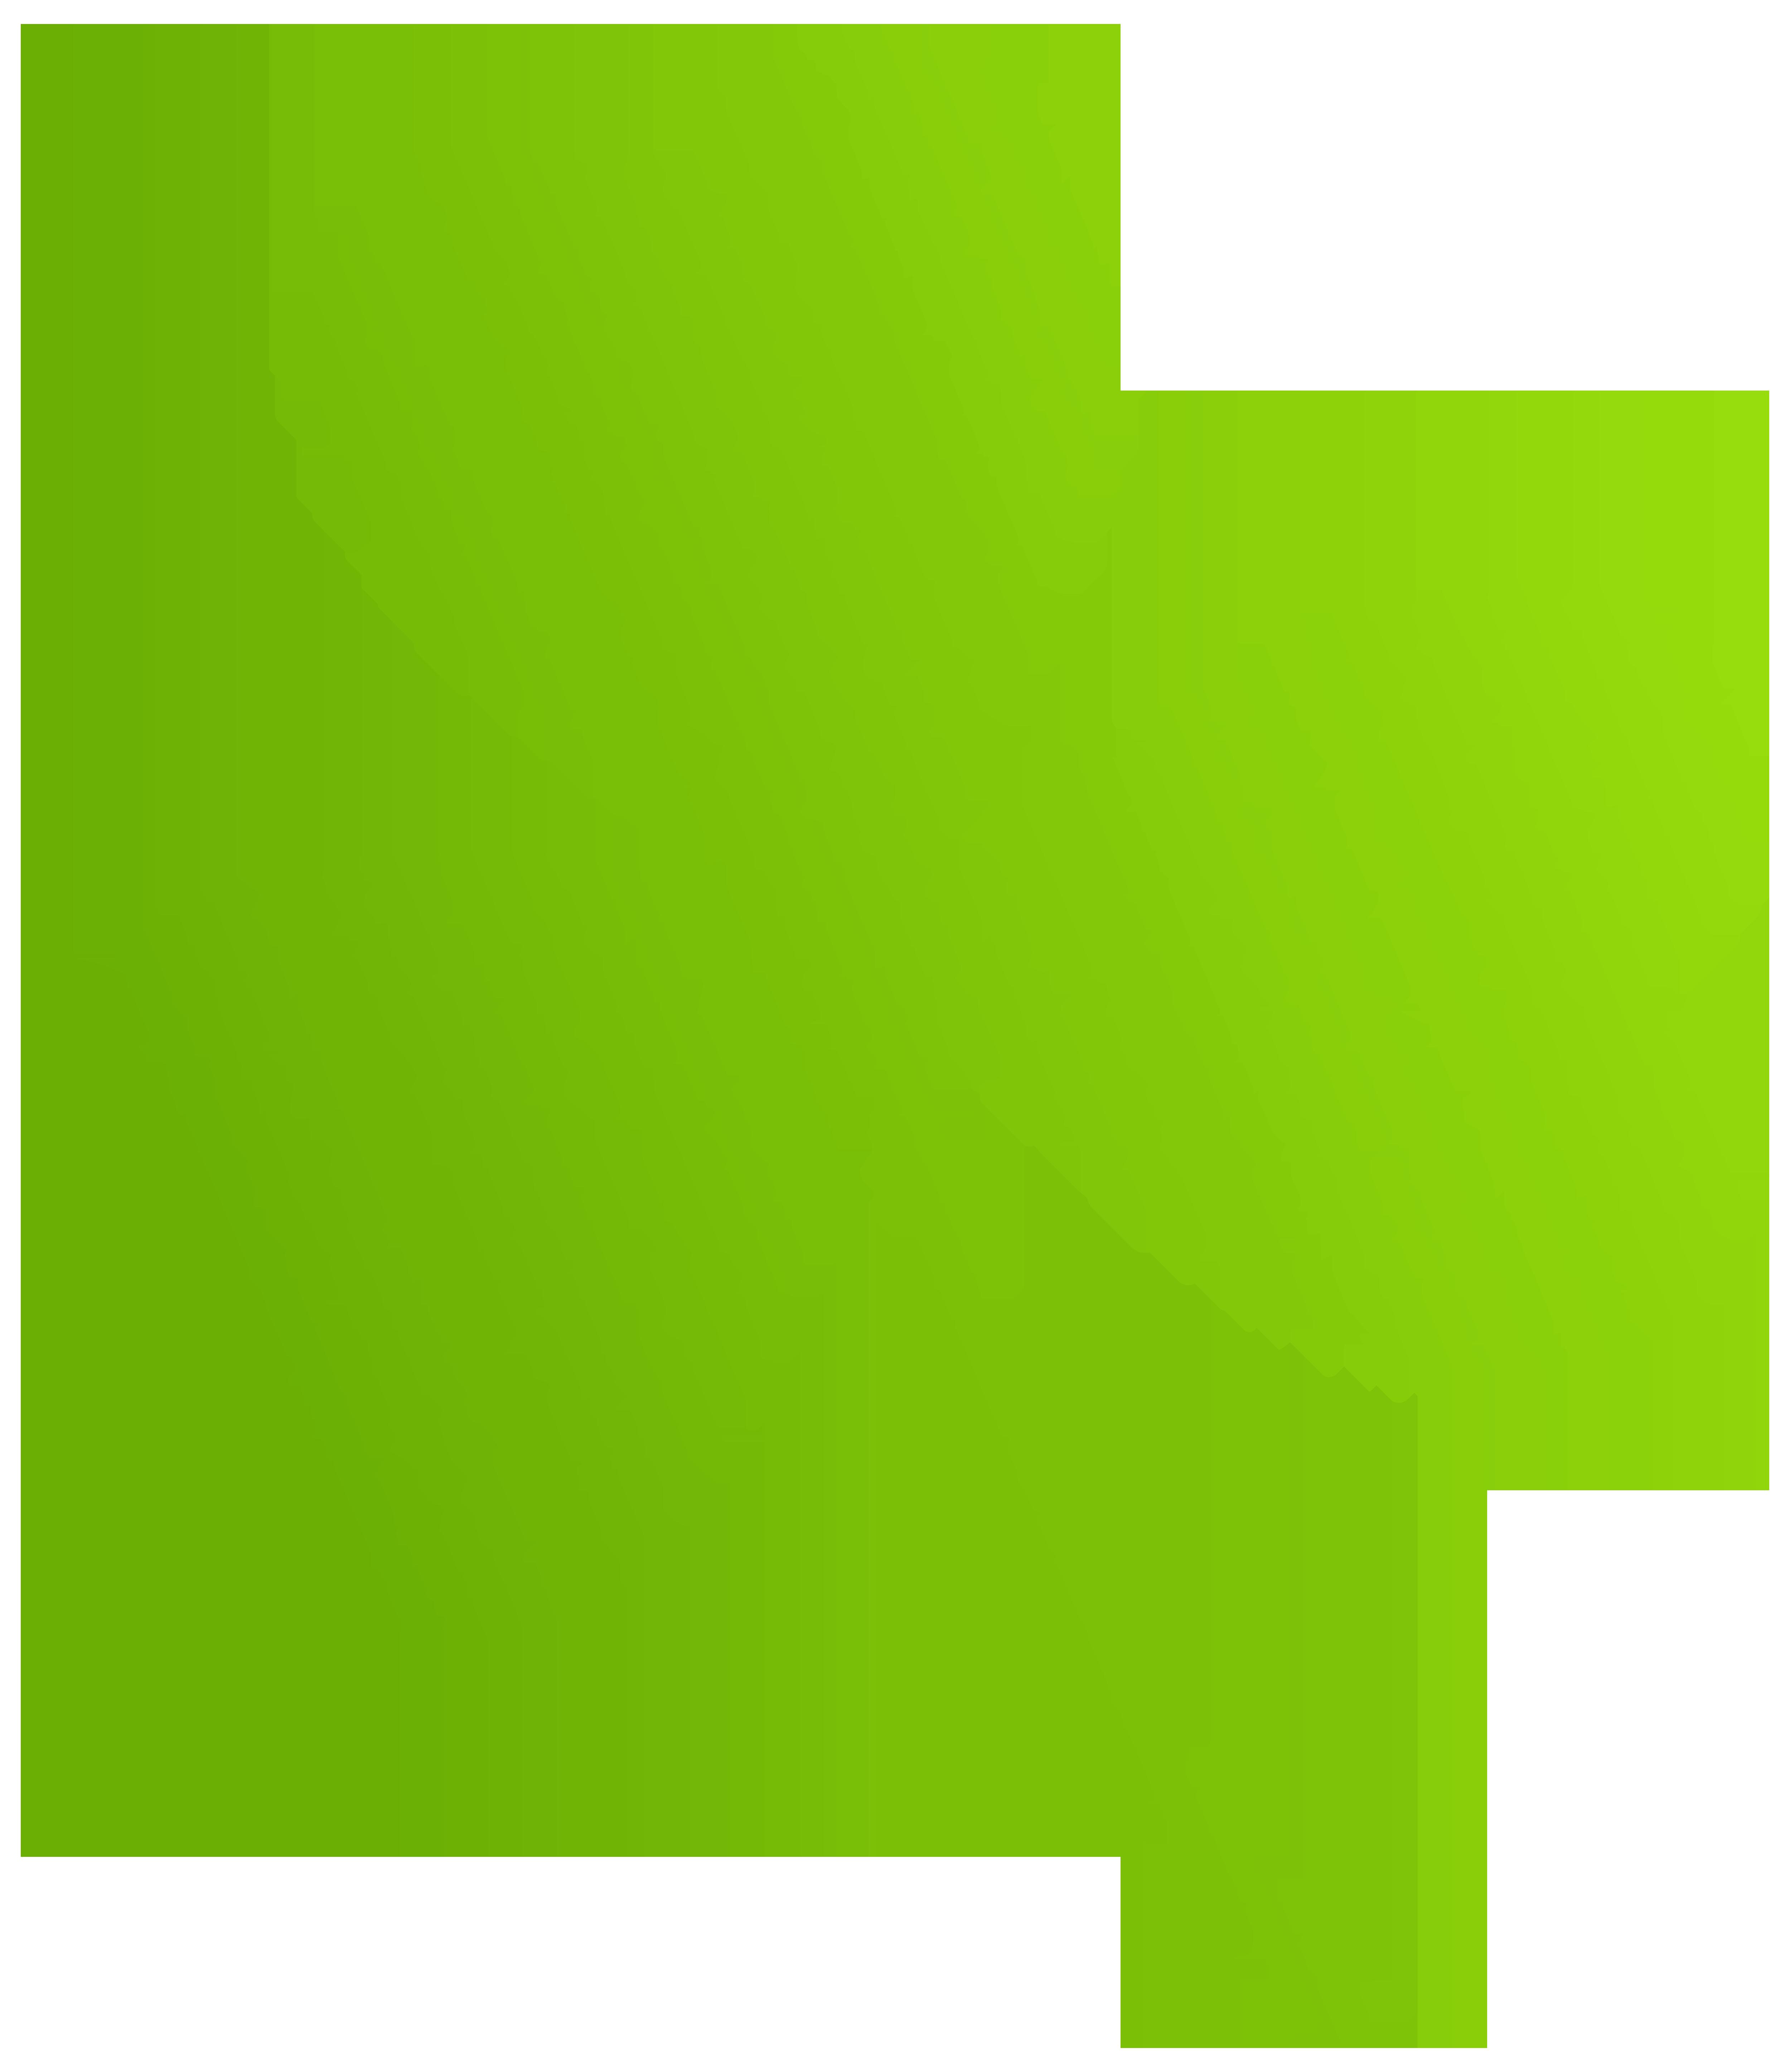 Green Day clipart eco friendly Clip Day  Patricks Art